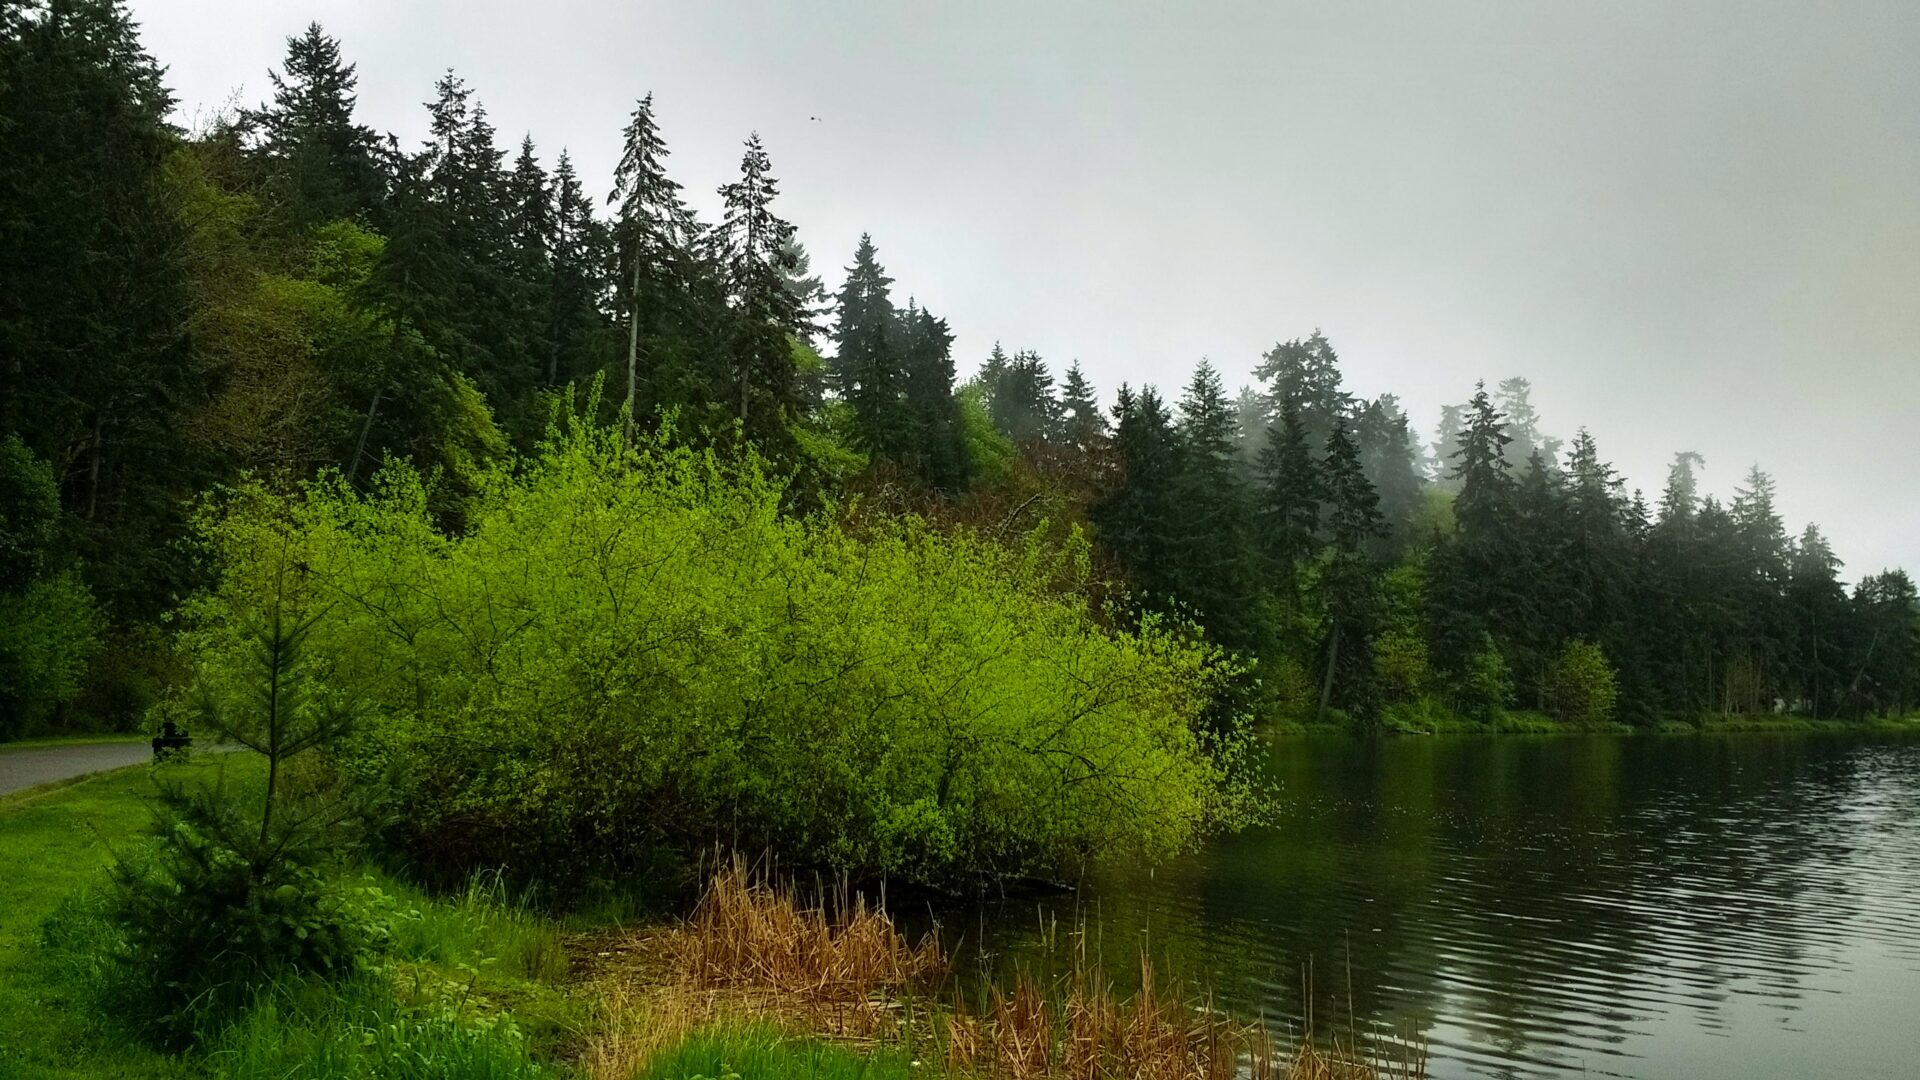 Dark green evergreen trees line the shoreline of Lake Washington in Seward Park on a foggy day.